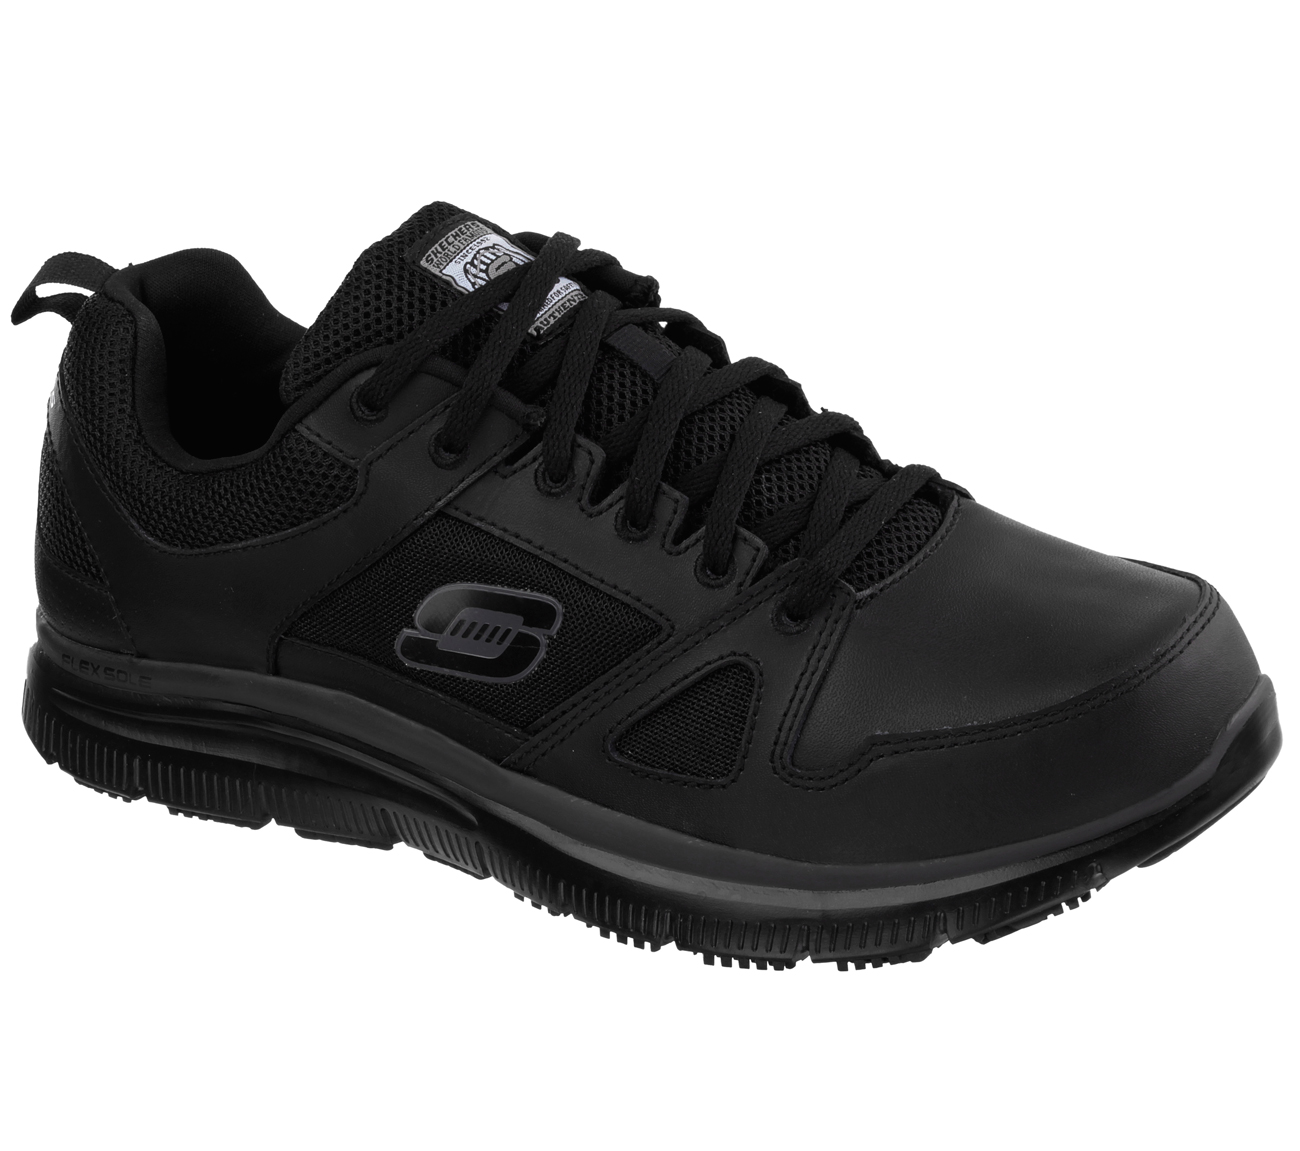 Skechers Flex Advantage Electrical Safety Mens Work Shoes